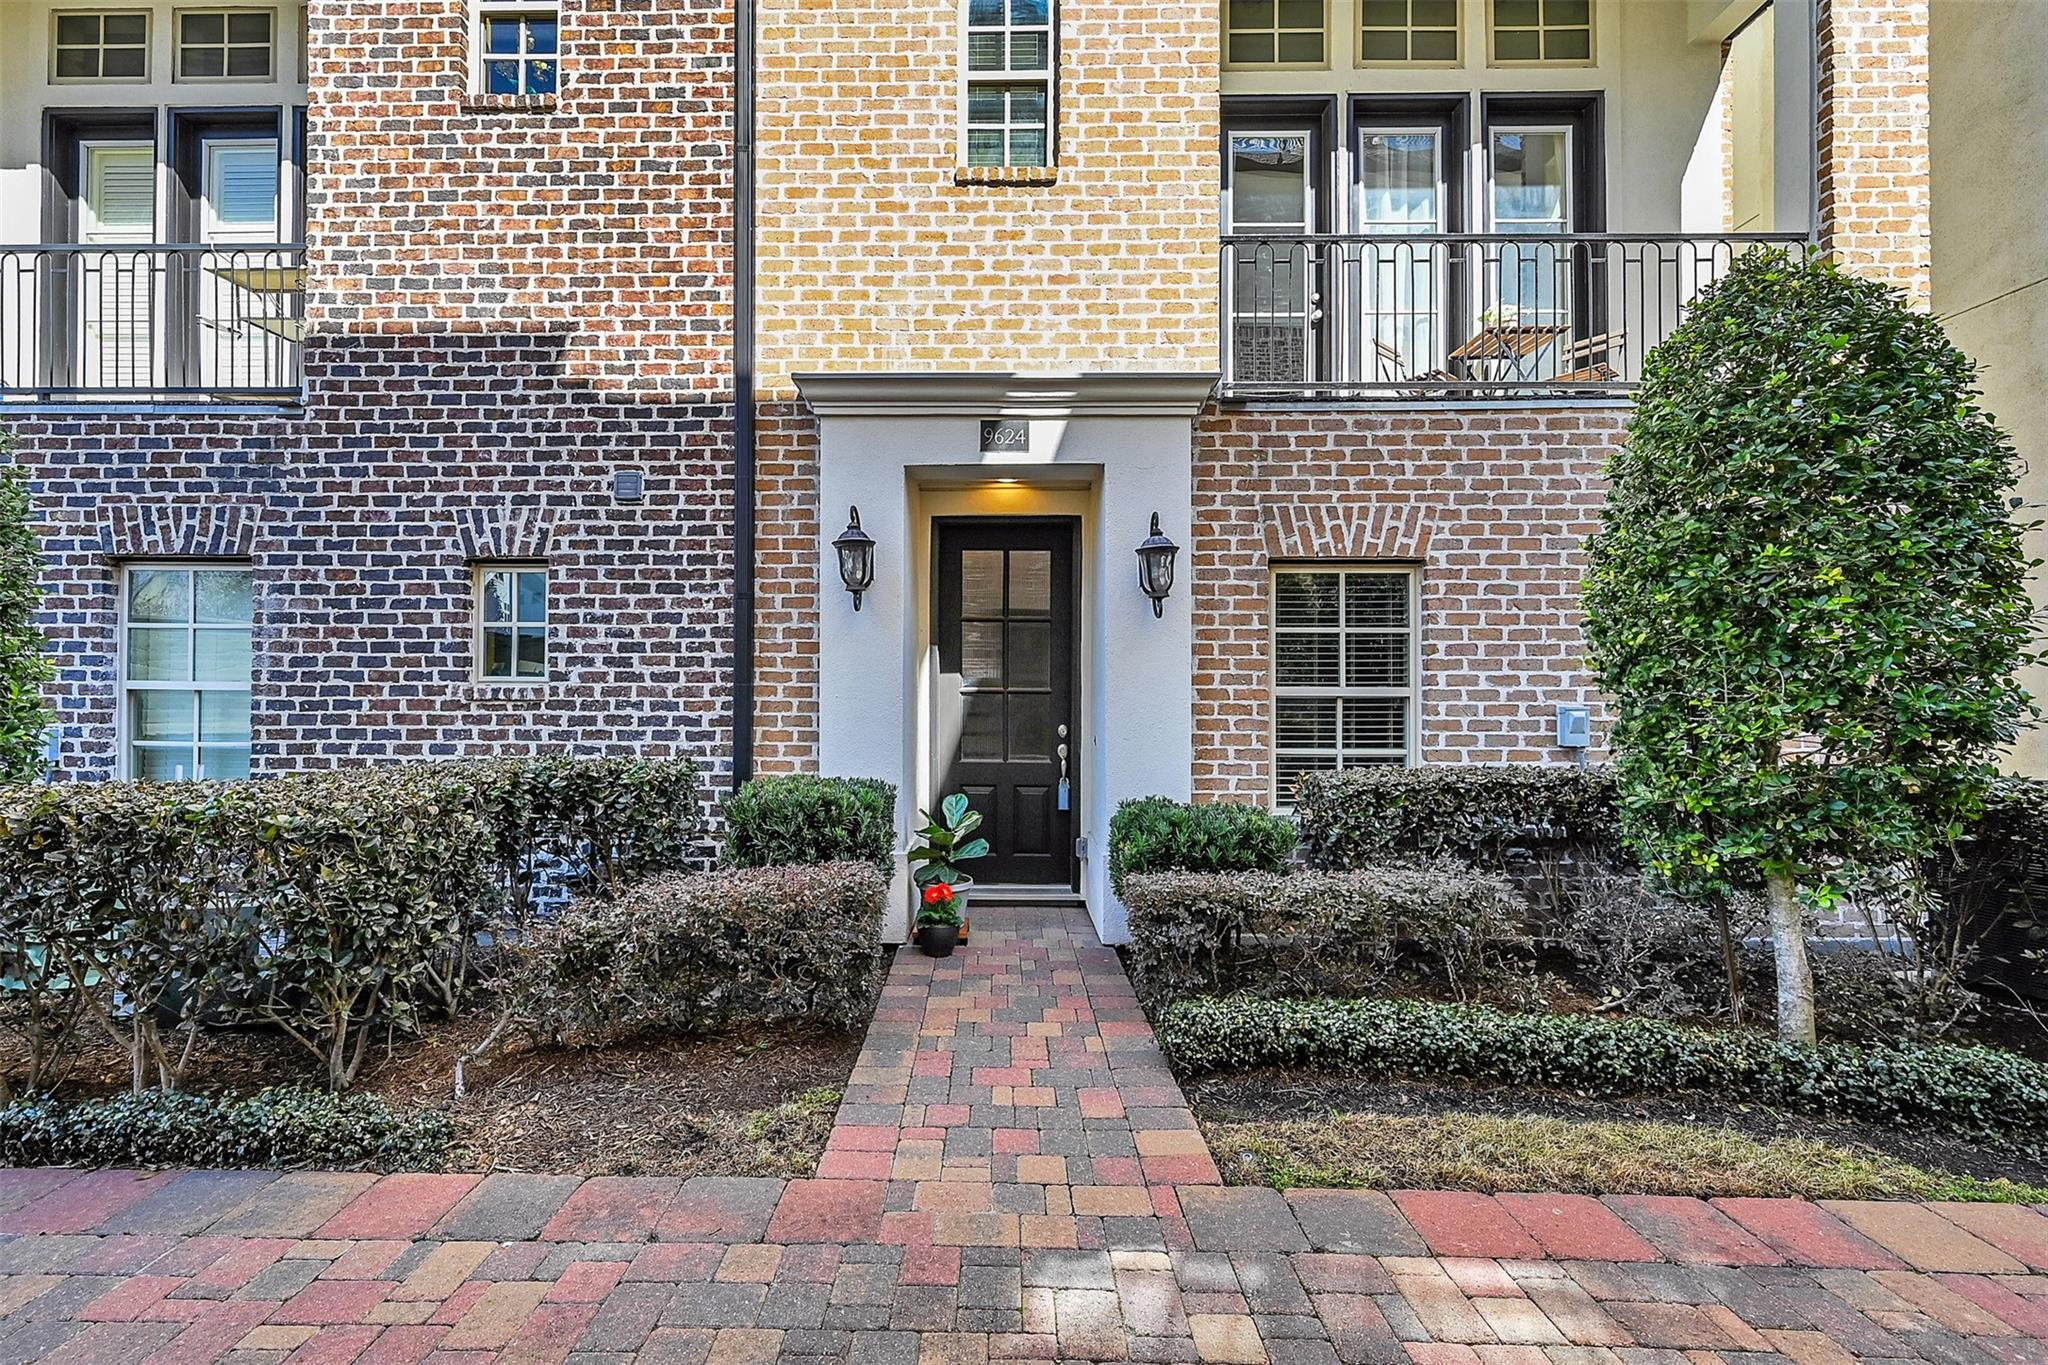 9624 Fannin Station W Property Photo - Houston, TX real estate listing